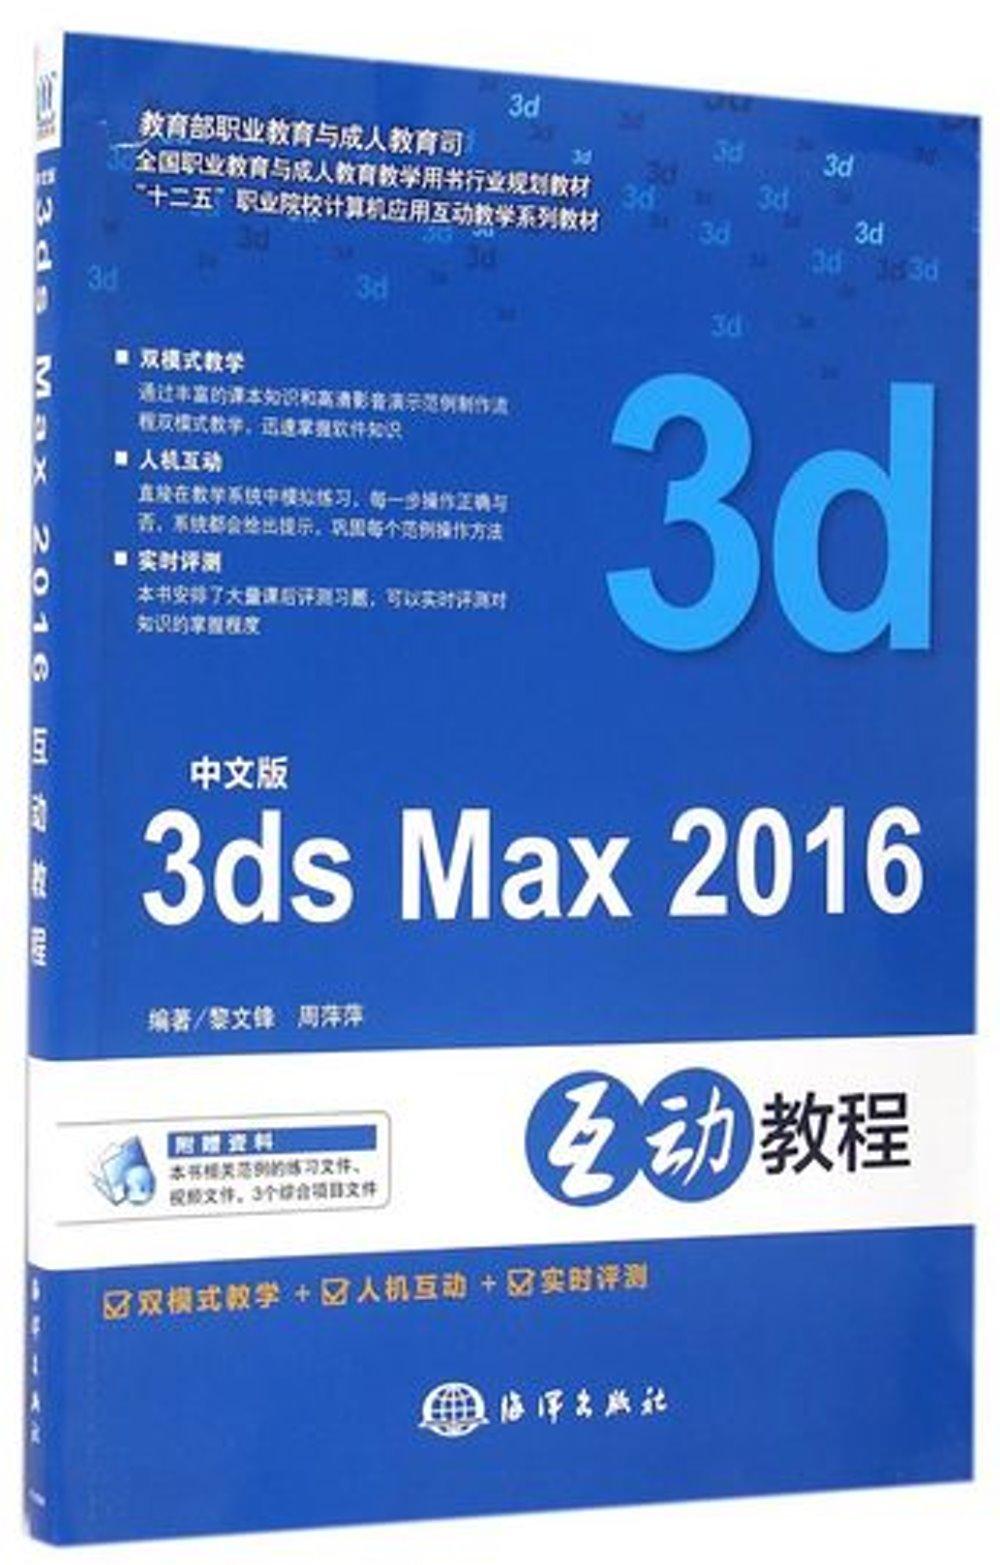 中文版3ds max 2016互動教程